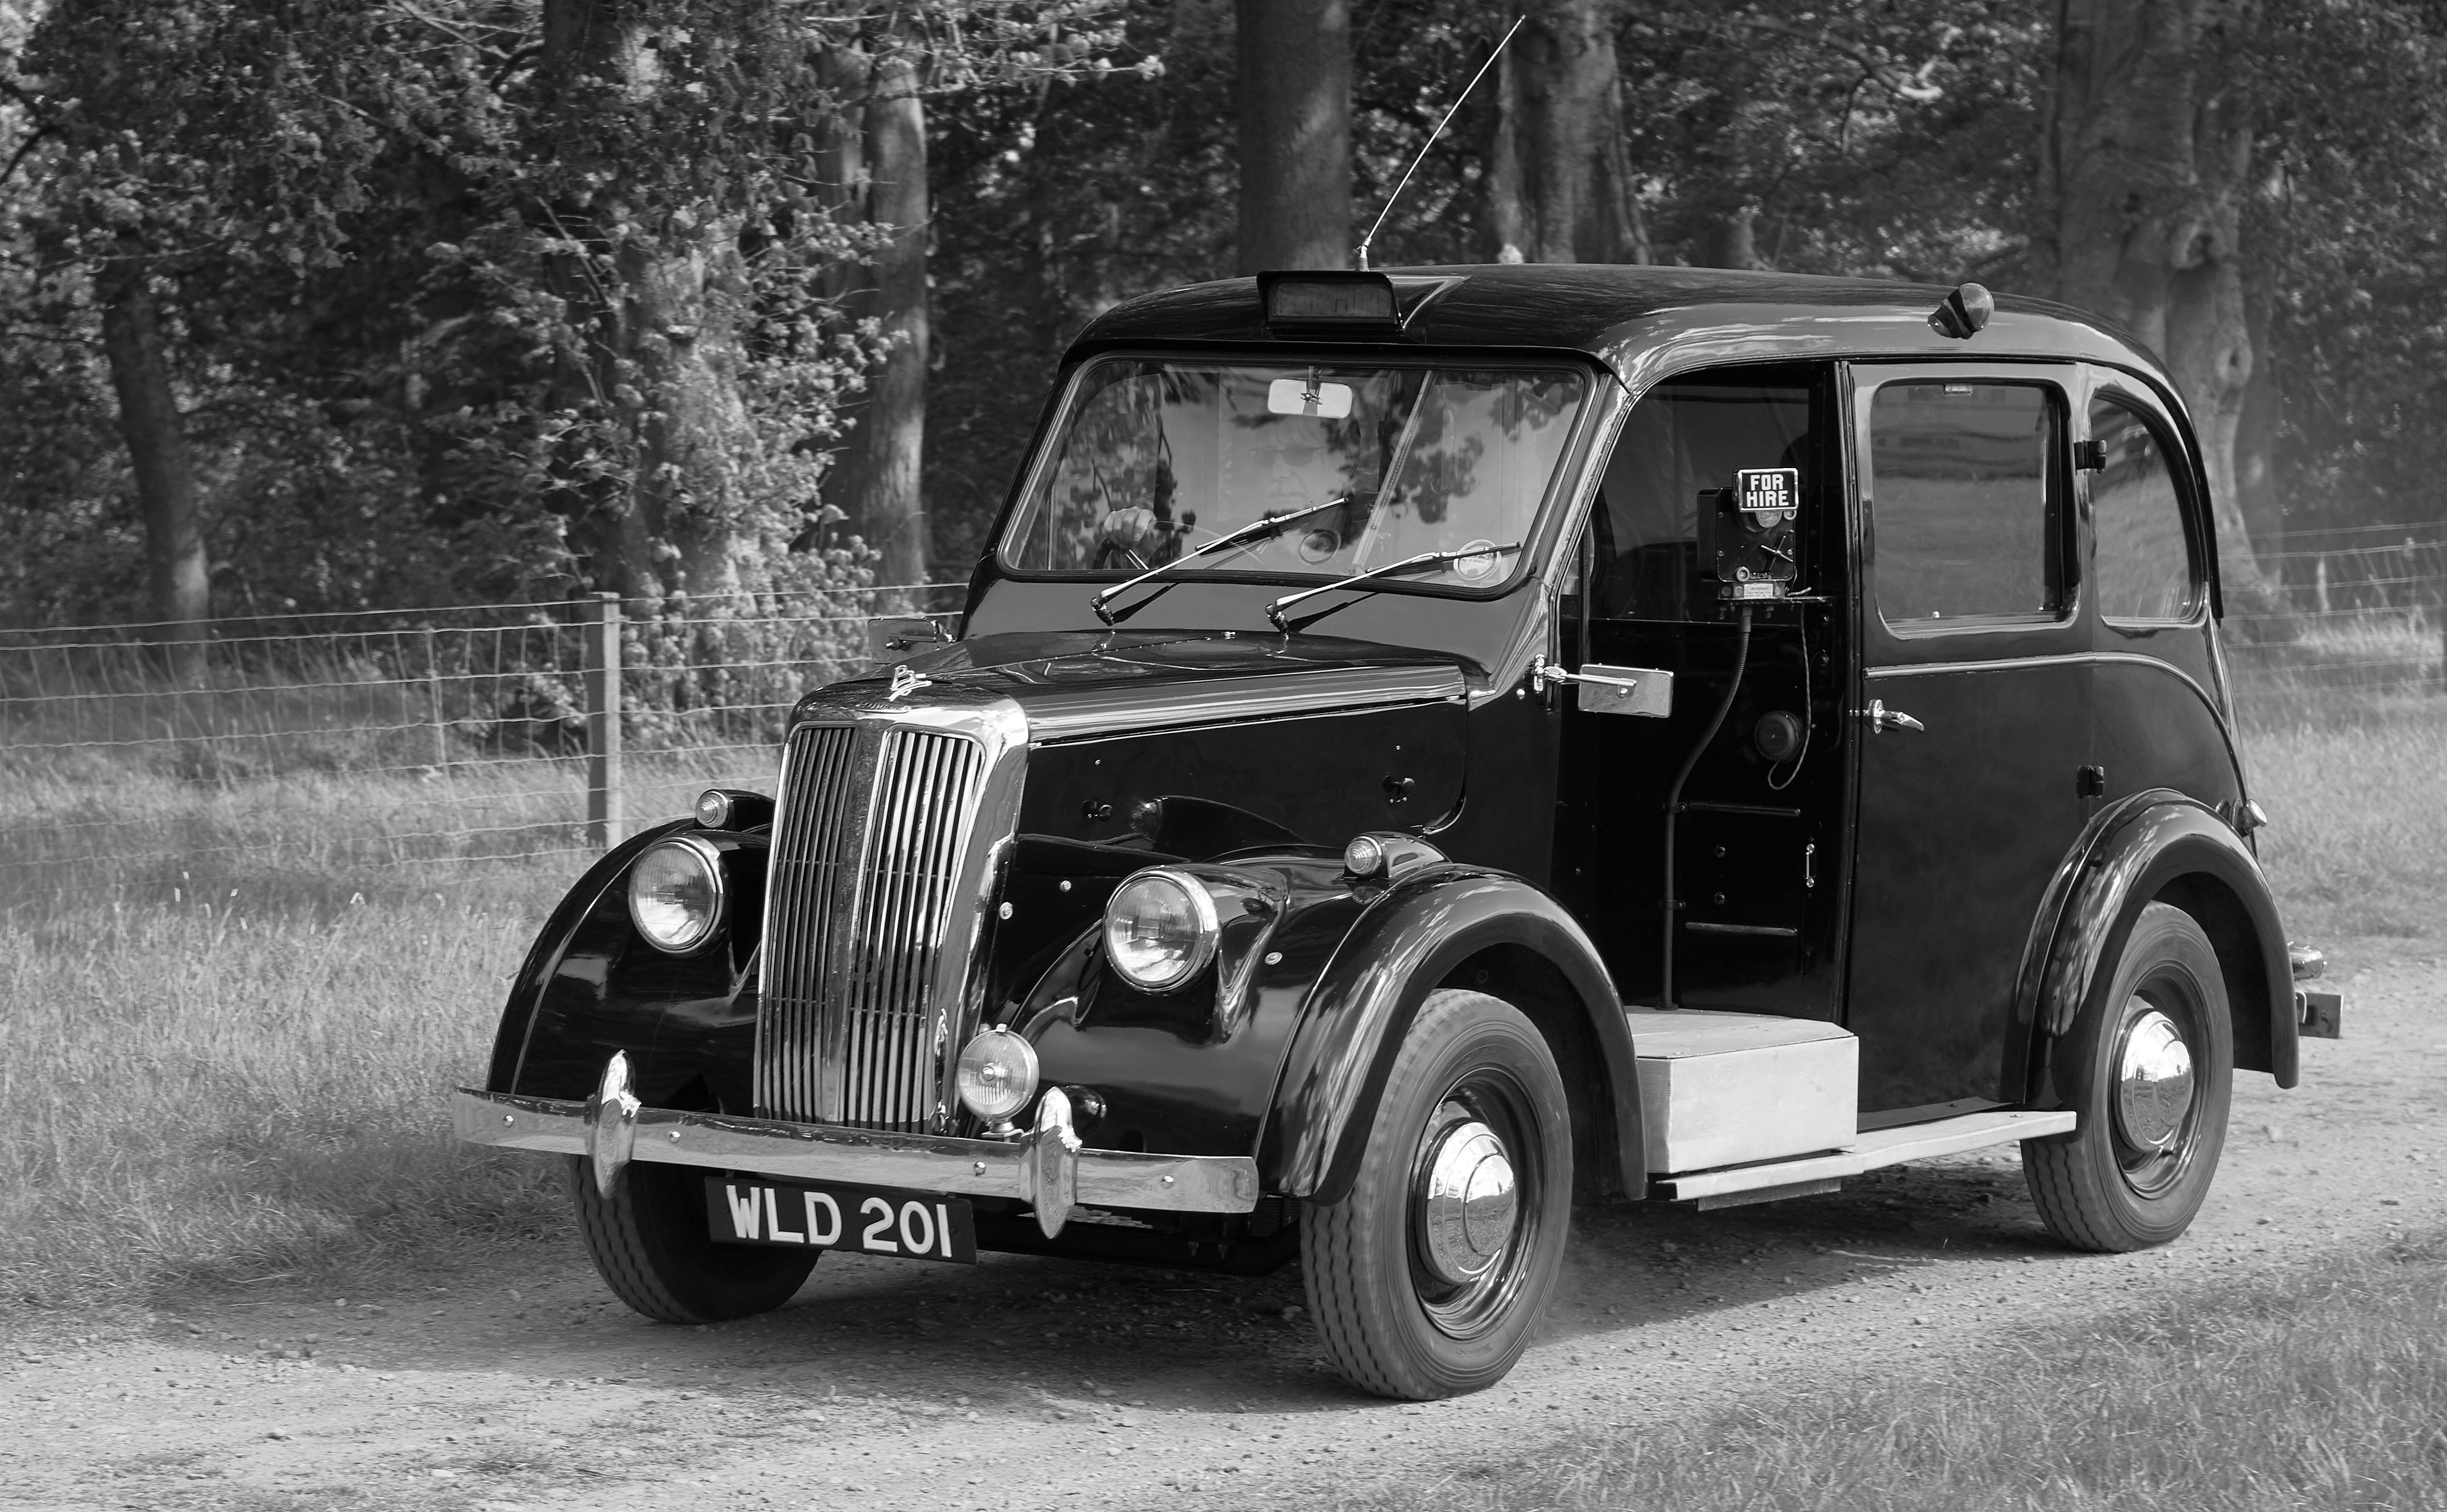 Beardmore Mk 7 Taxi, Blackandwhite, Car, Monochrome, Outdoor, HQ Photo